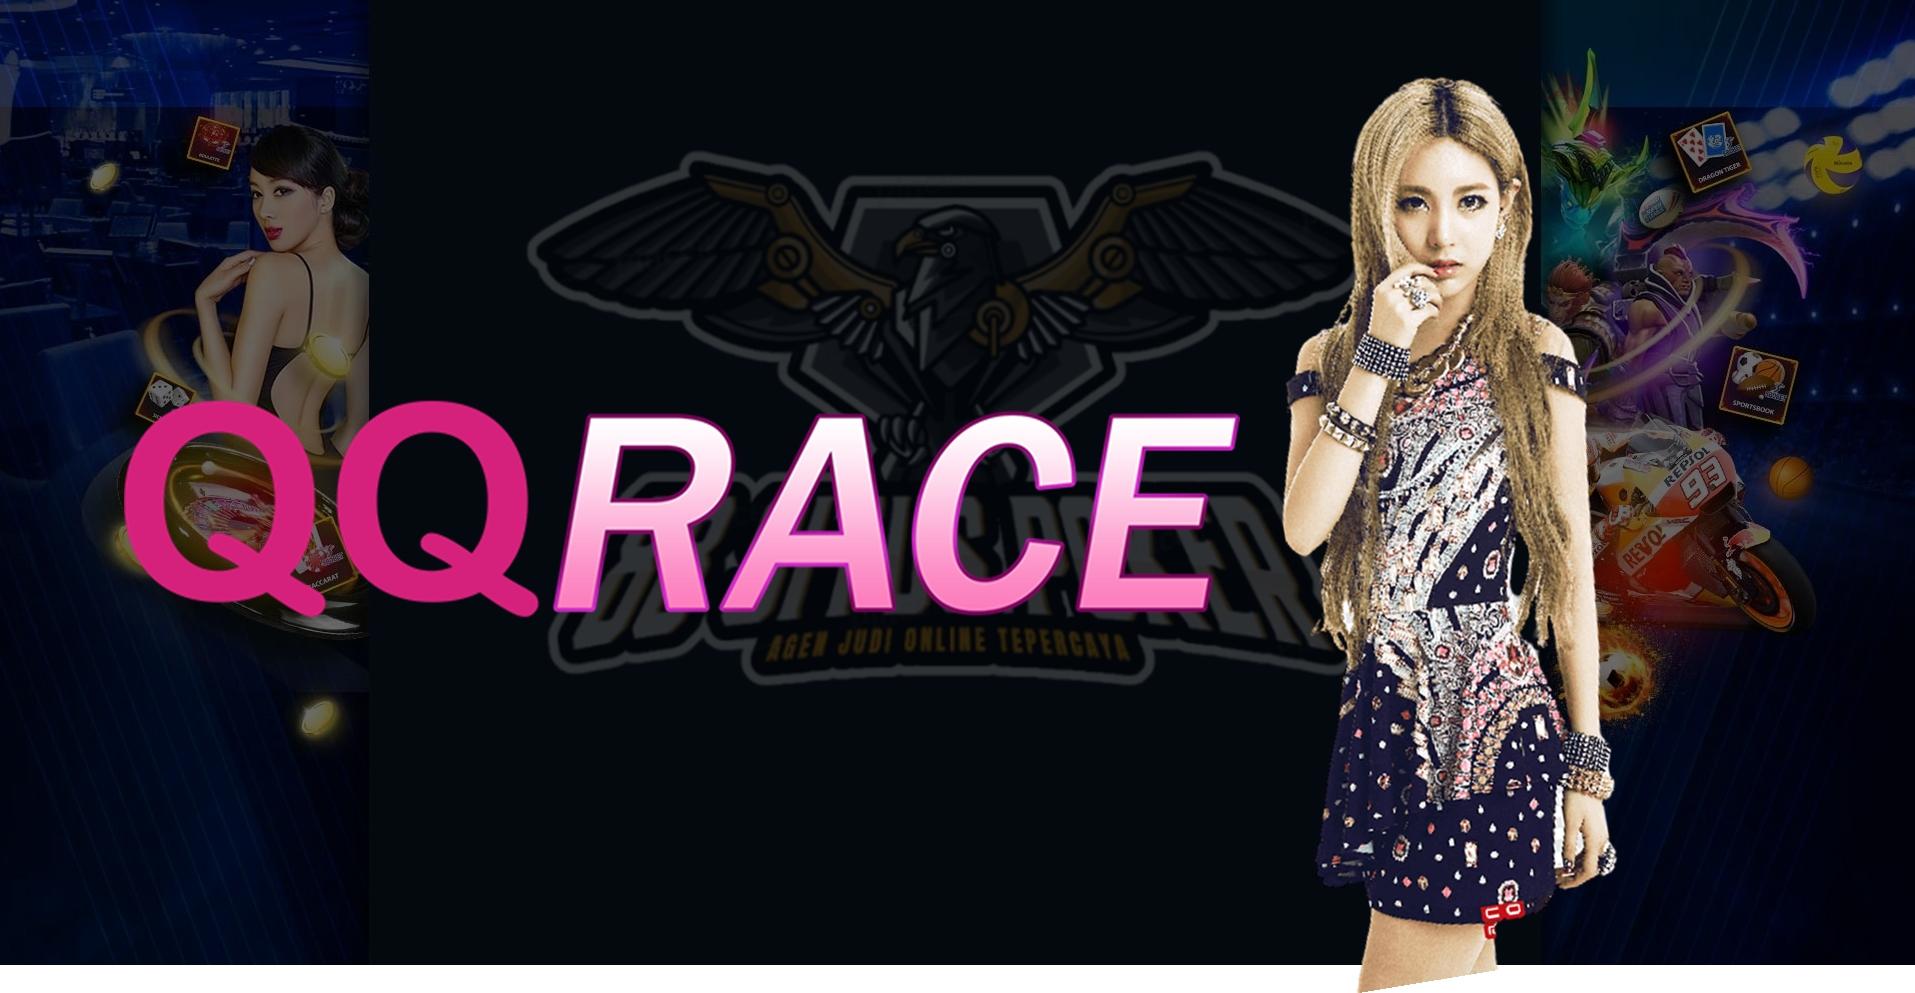 QQrace Situs Slot Online Terpercaya 2020